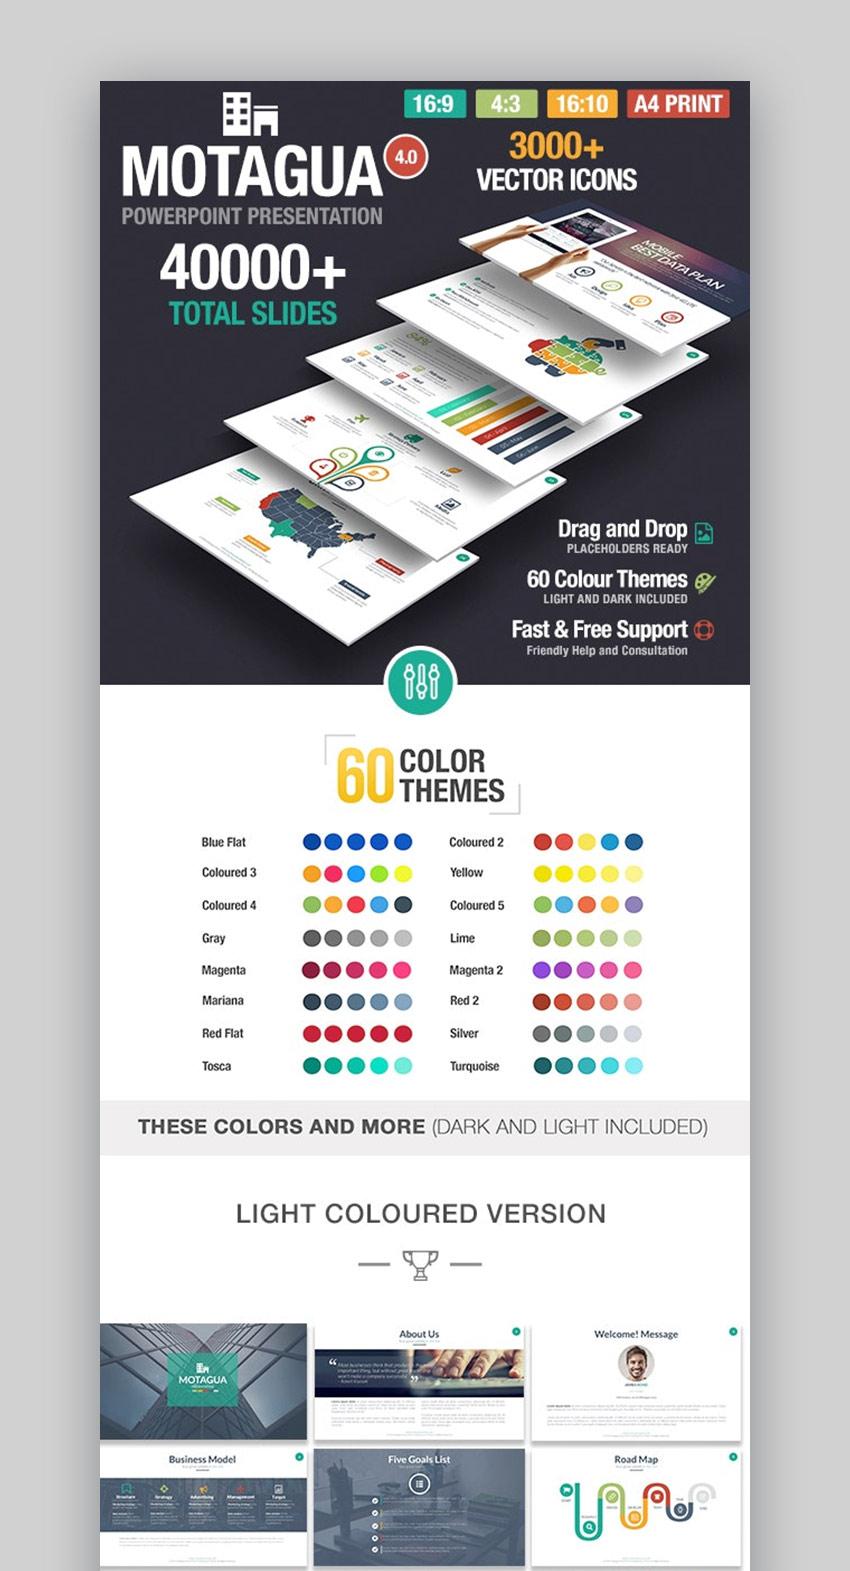 Motagua Best Designed PowerPoint